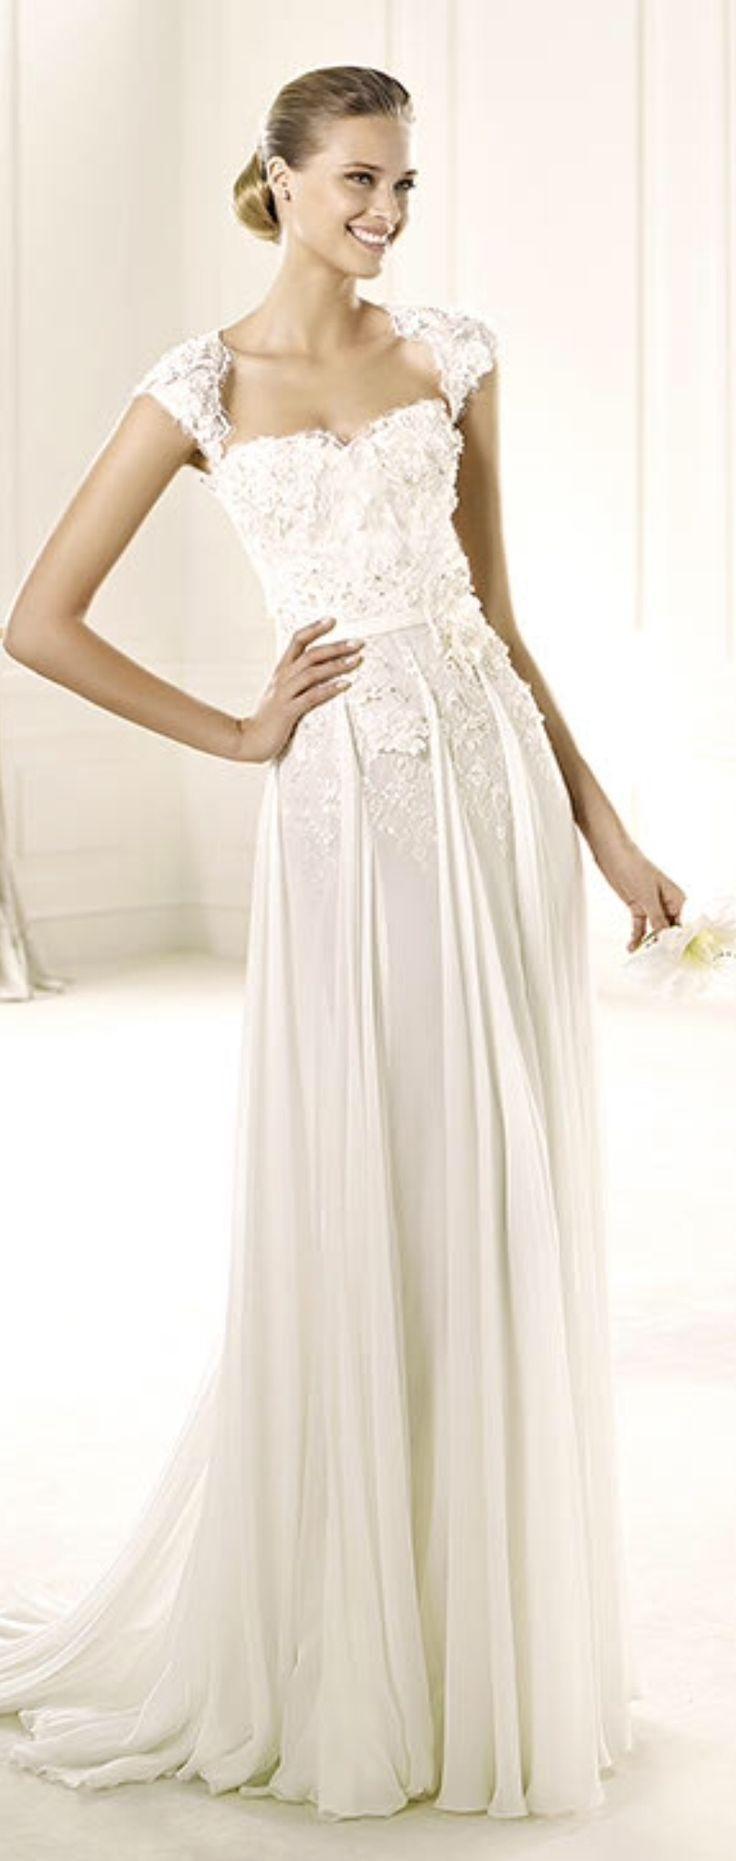 Wedding - Elie Saab 2014 Collection